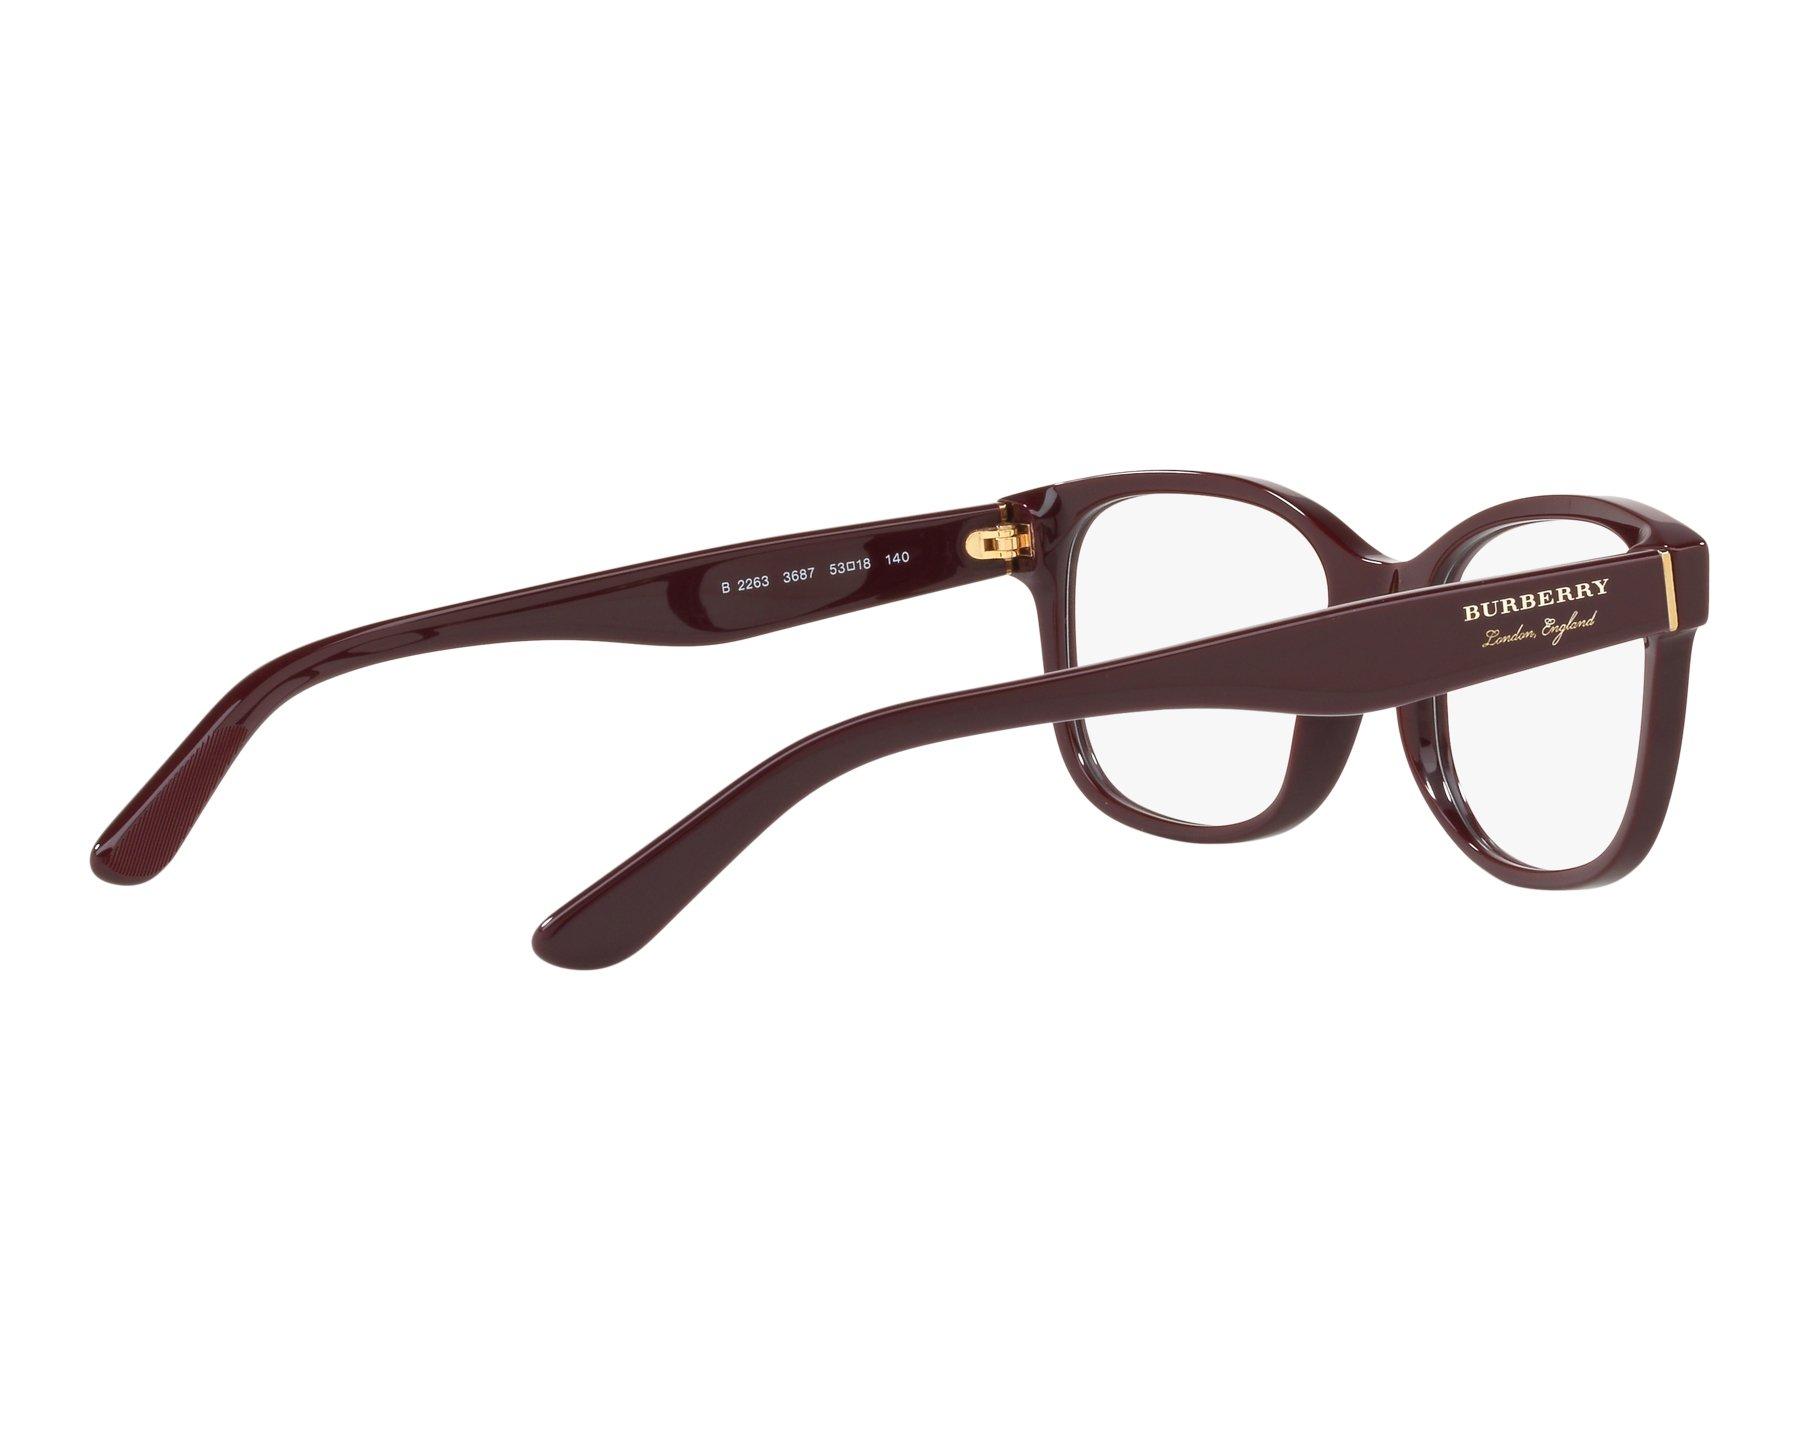 eyeglasses Burberry BE-2263 3687 51-18 Bordeaux 360 degree view 9 a14a5e73305d